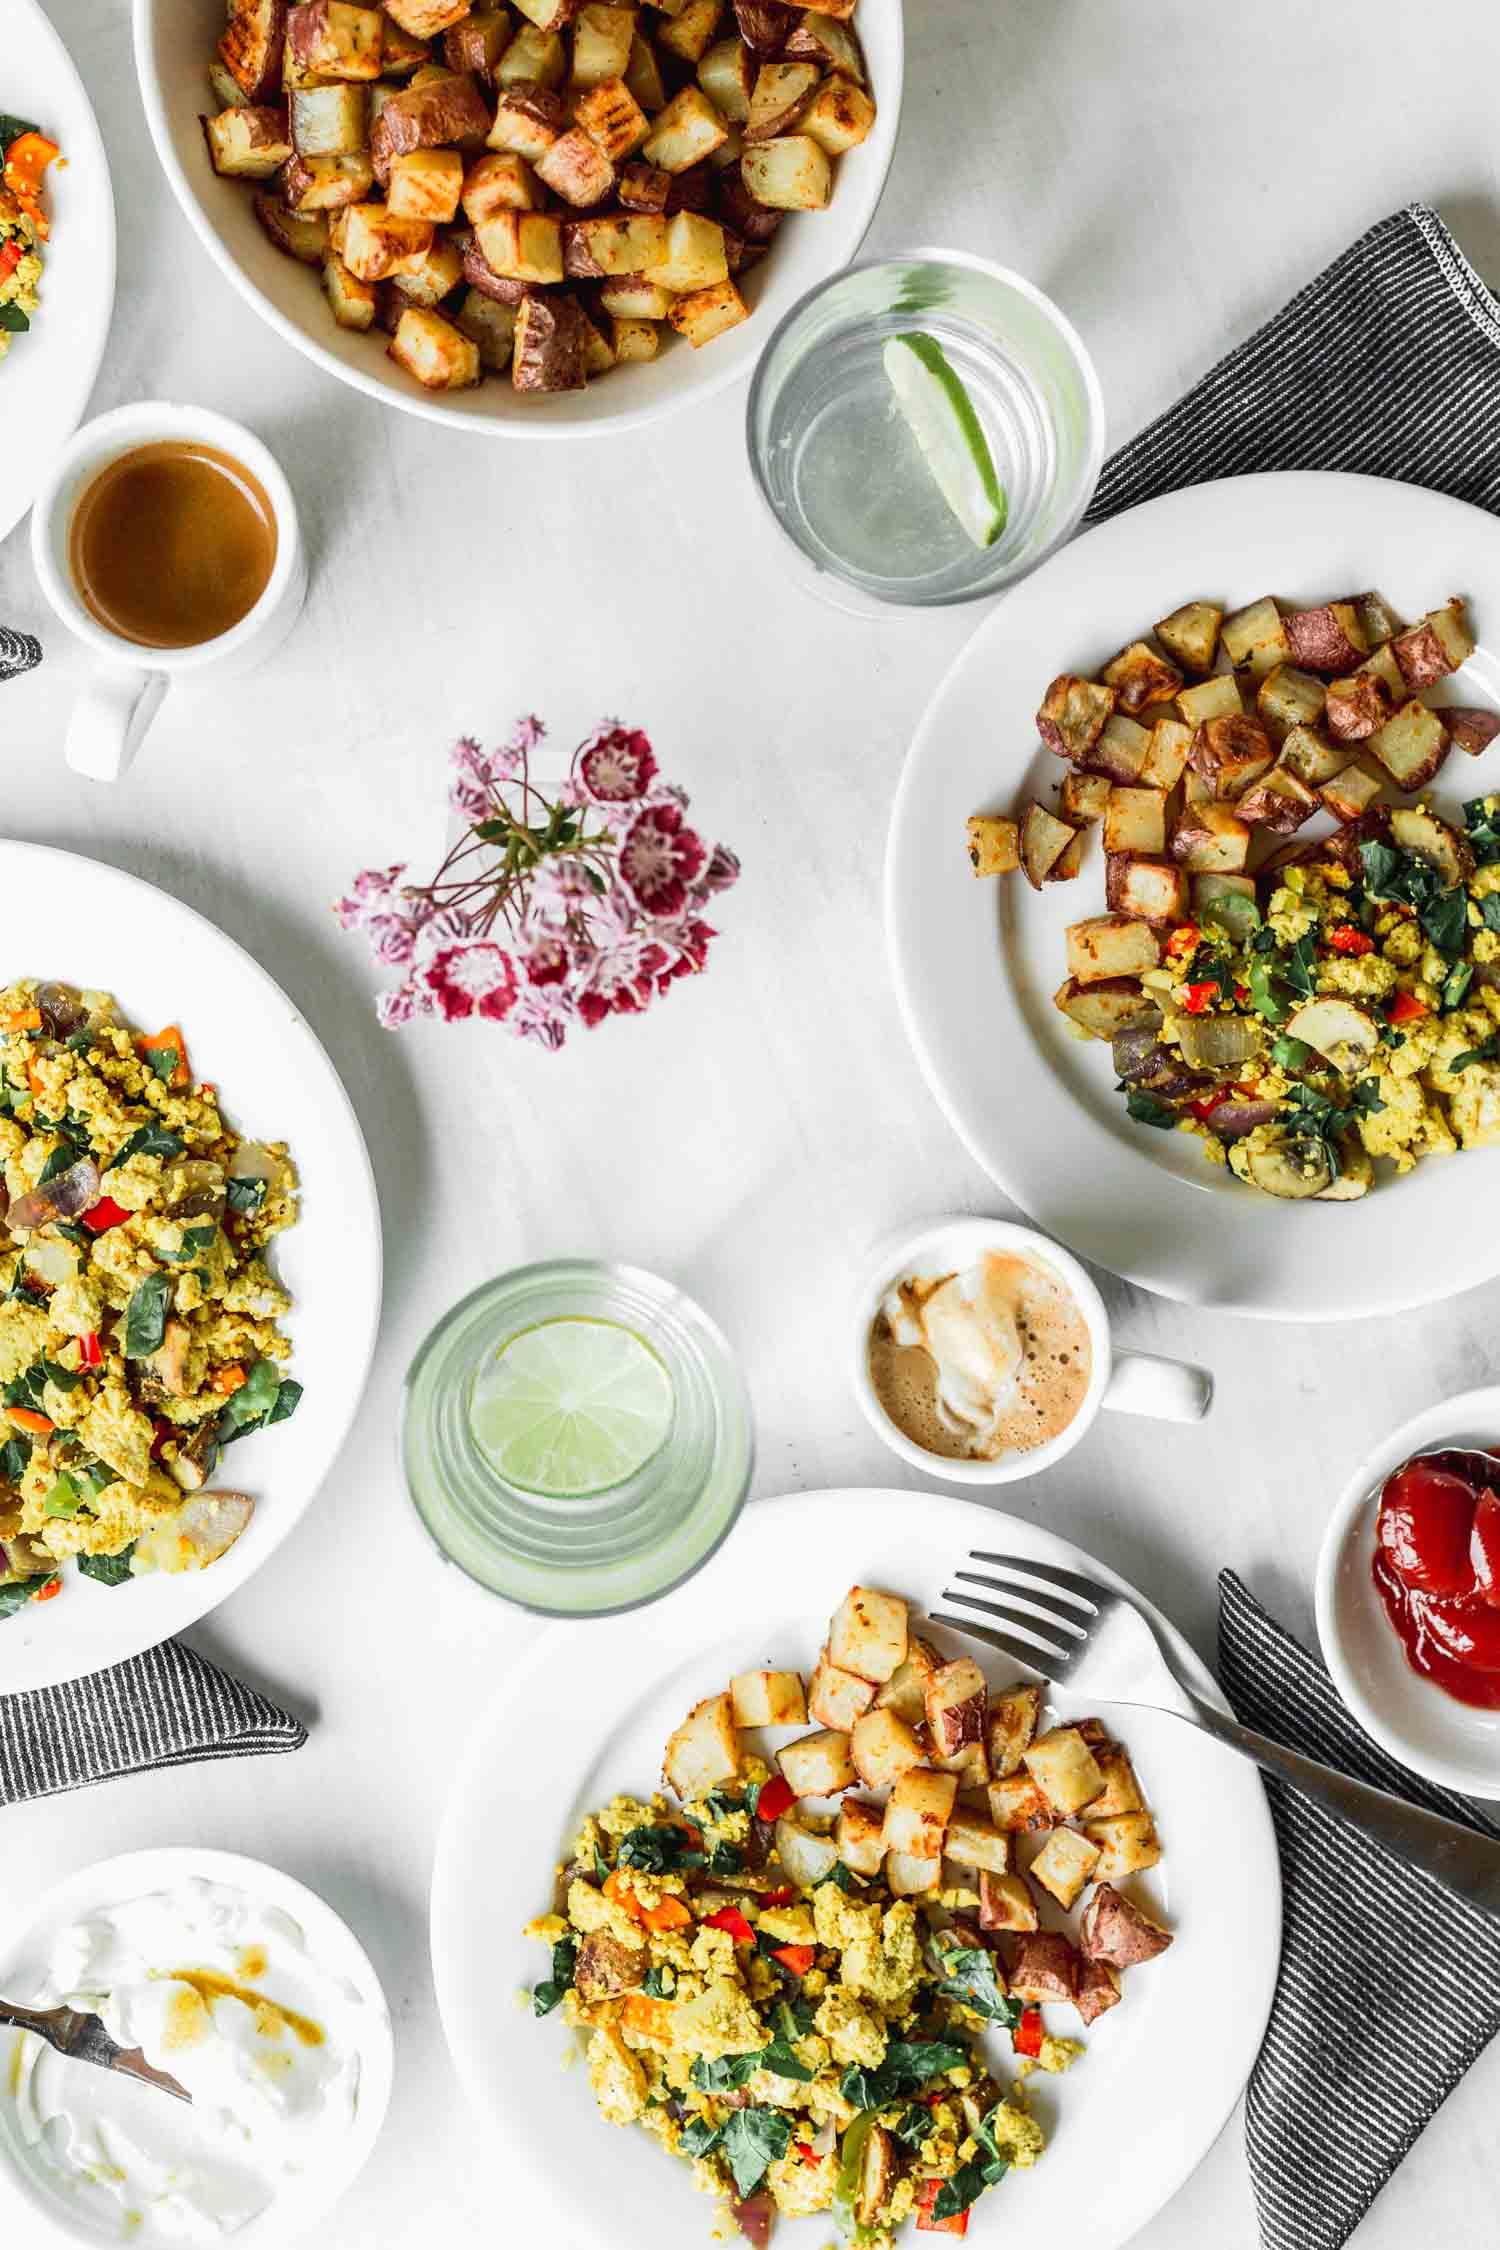 Veggie-Packed Scrambled Tofu recipe & photo by Beautiful Ingredient. vegan | gluten-free | oil-free | easy | veggie-packed | 30 minutes or less | breakfast | brunch